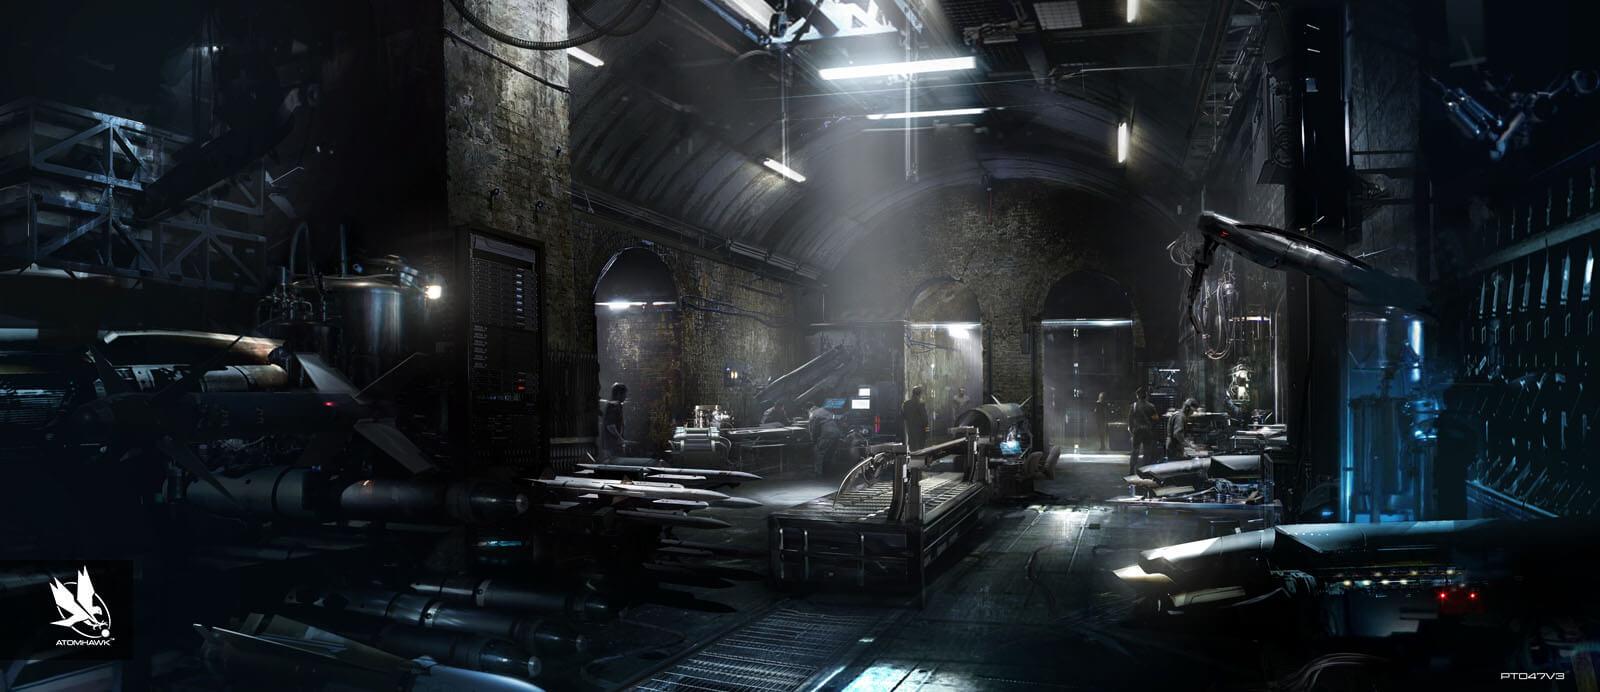 Atomhawk_Marvel_Avengers-Age-Of-Ultron_Concept-Art_Environment-Design_Weapon-Storage-Facility.jpg